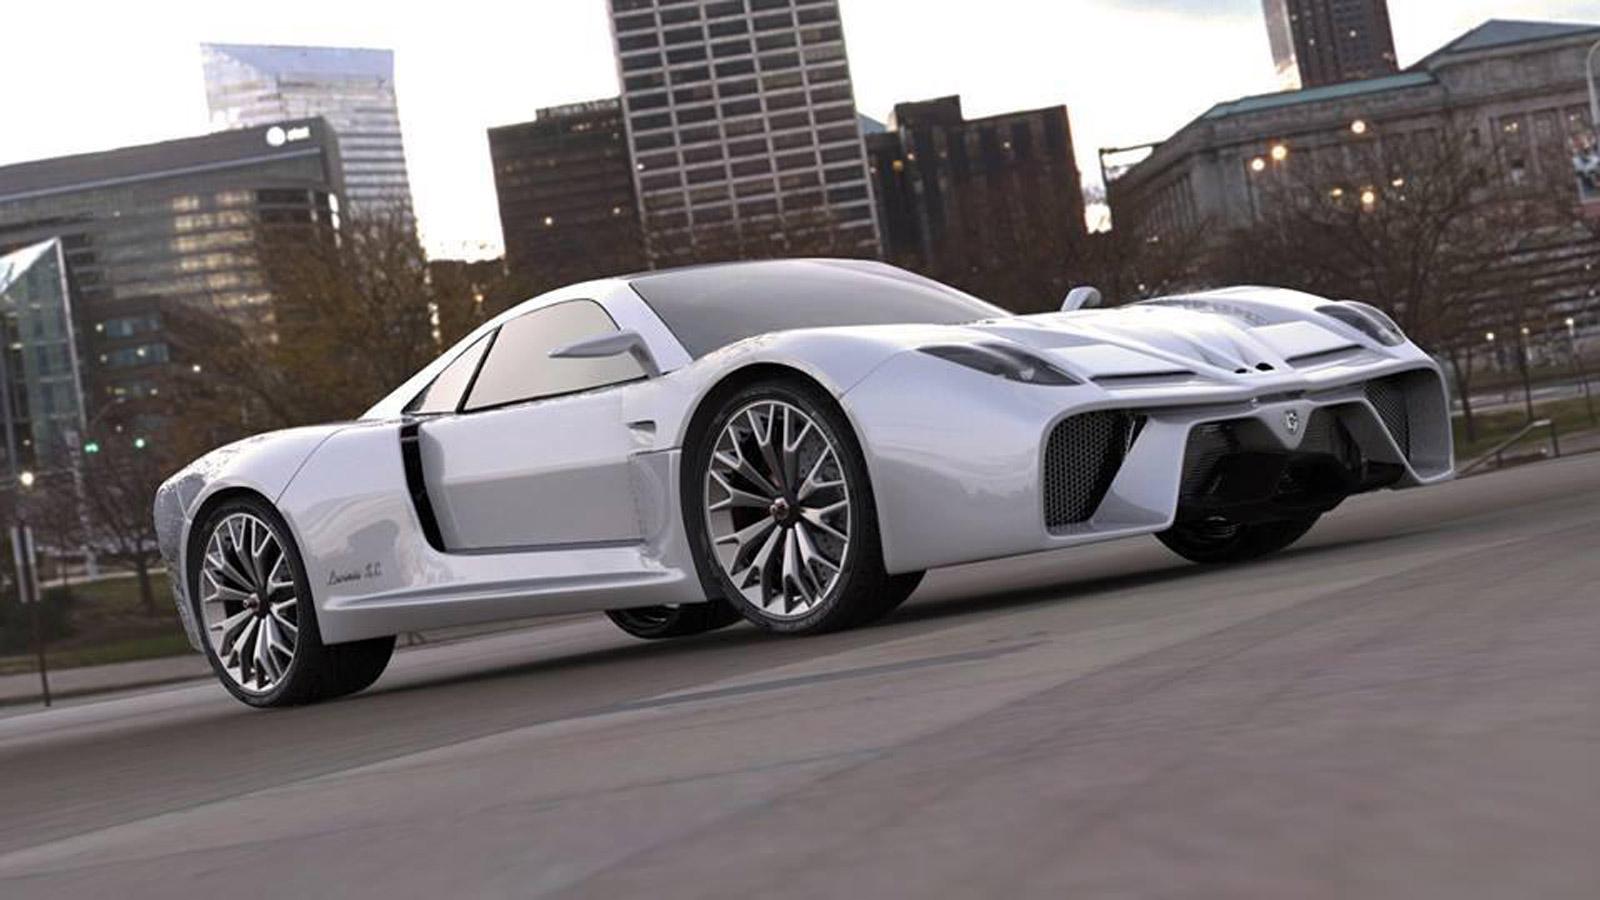 Italian Firm Plans Electric Supercar